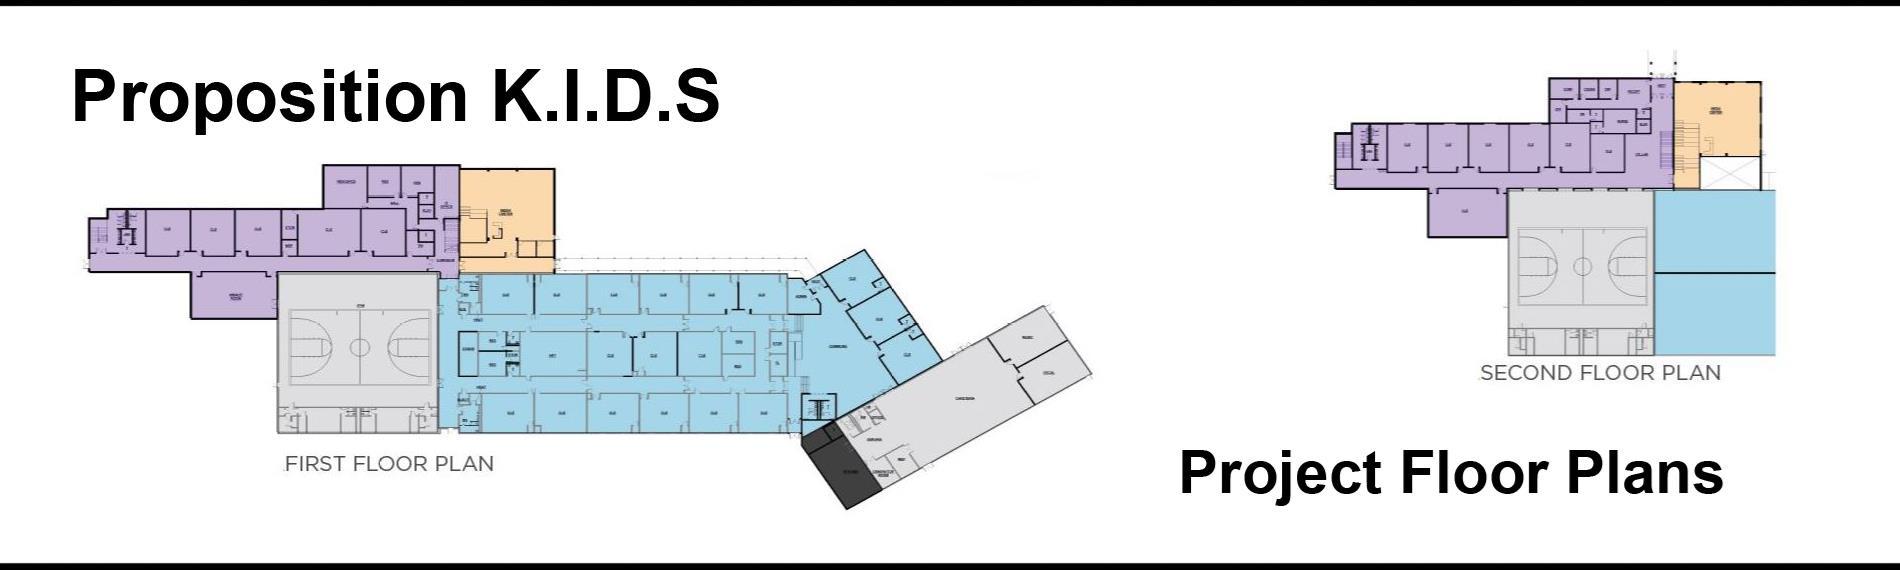 Project Floor Plans